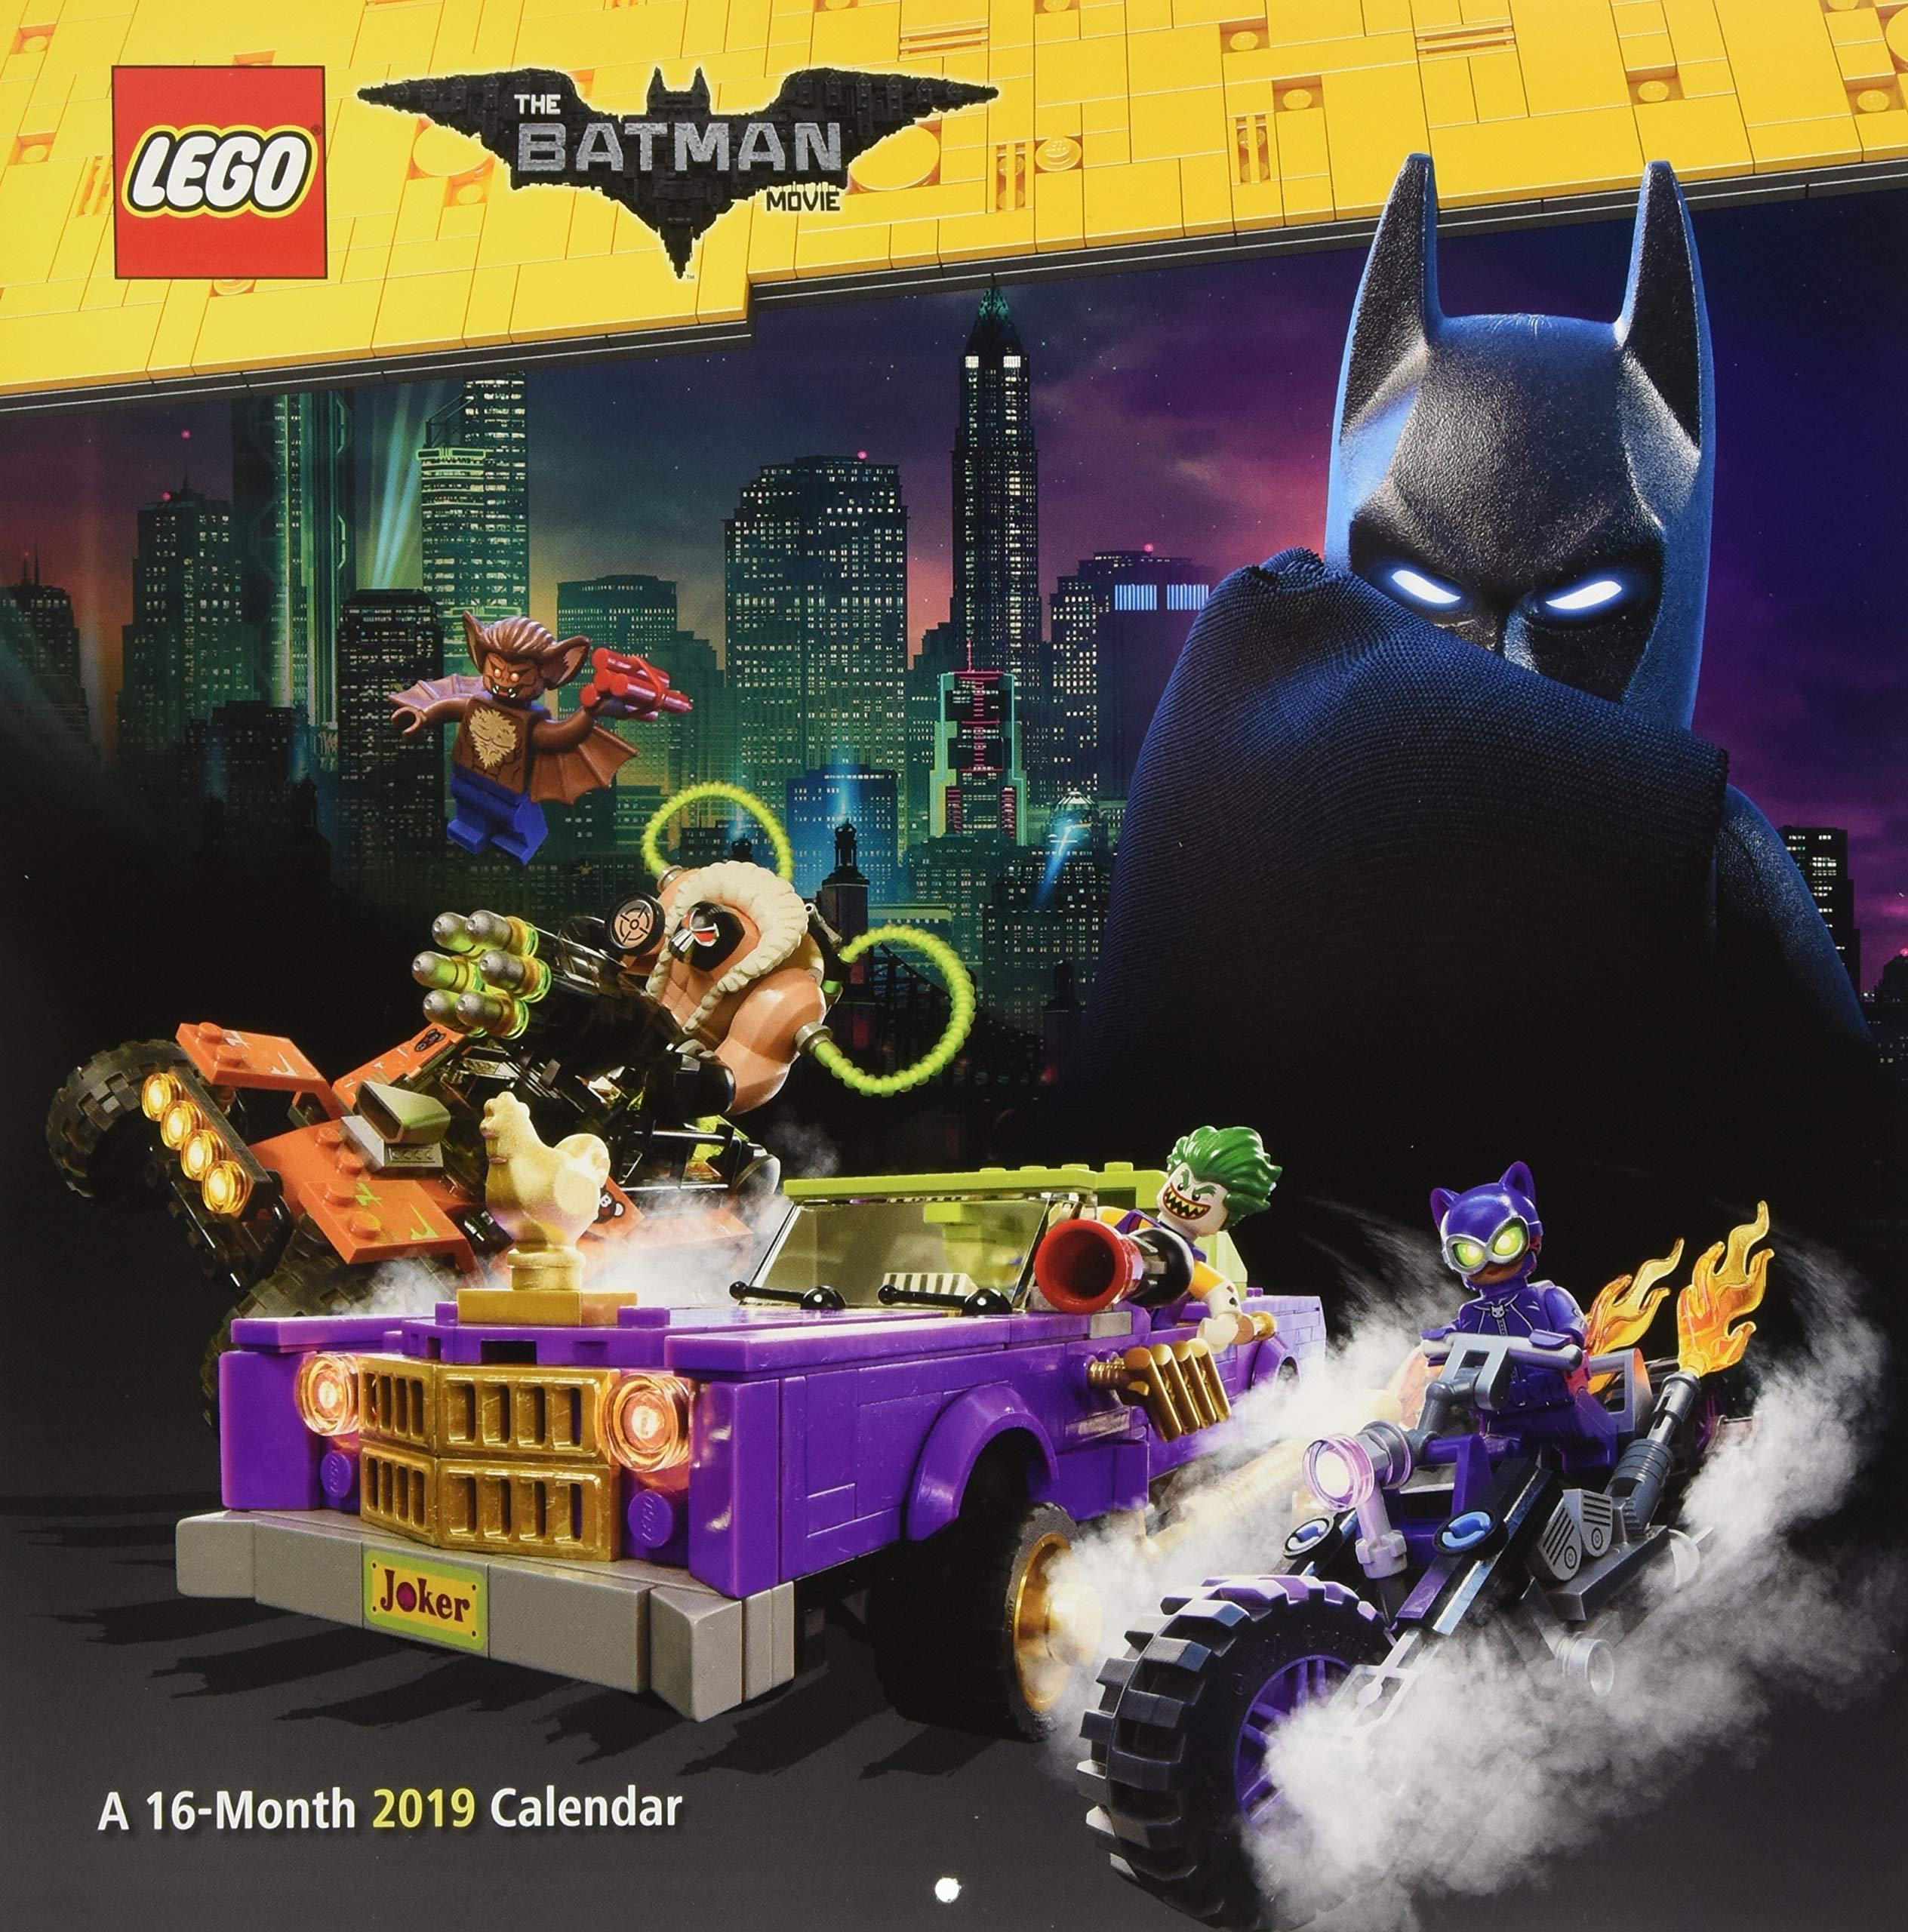 2019 The Lego Batman Movie Wall Calendar